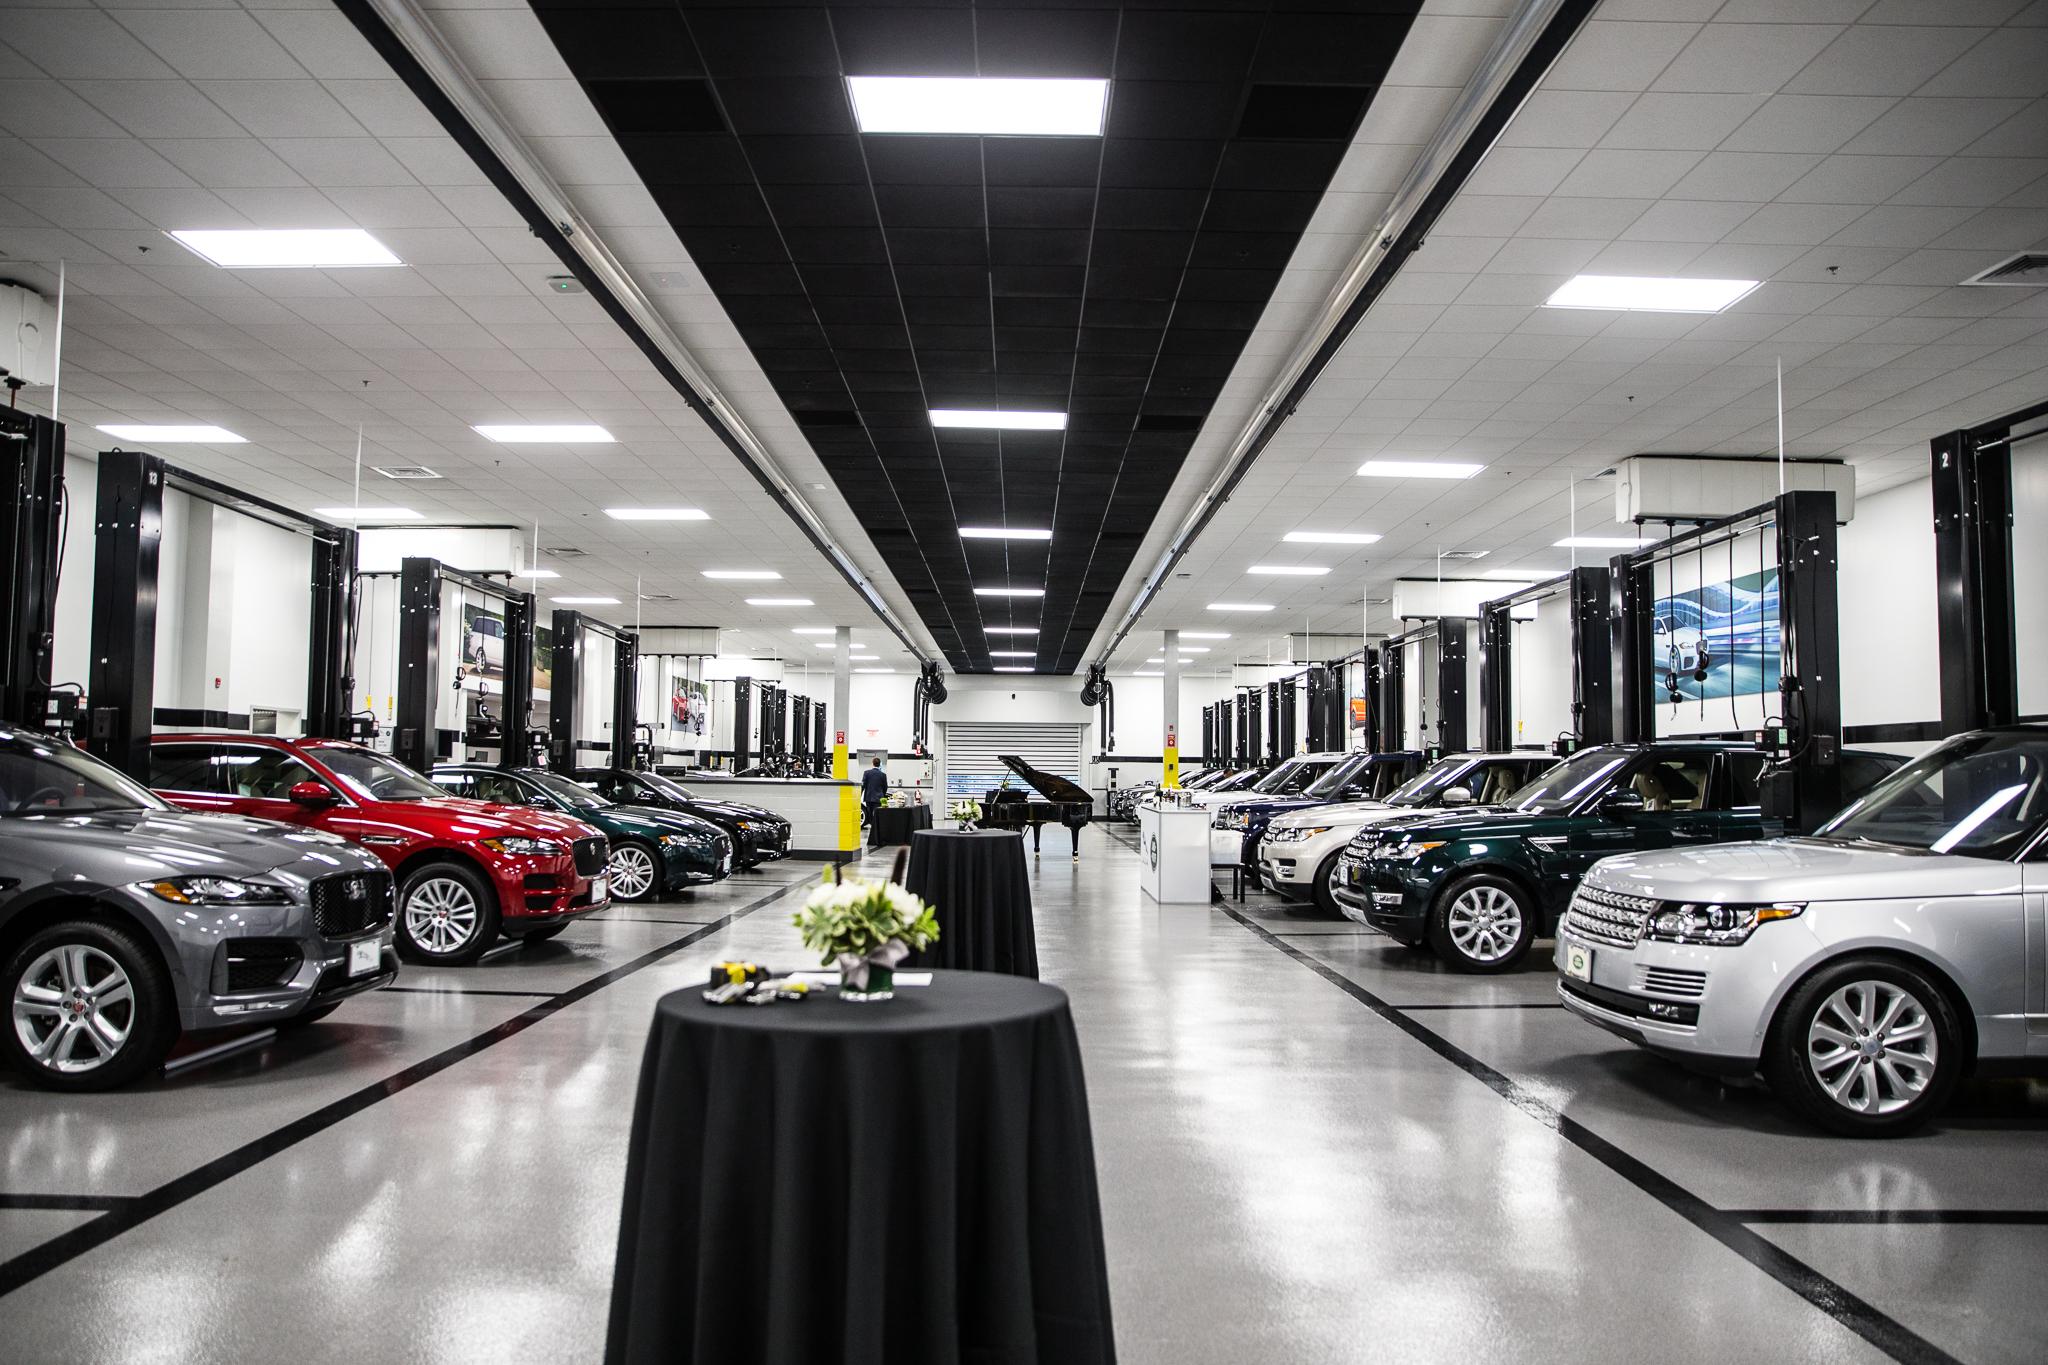 Land Rover Darien >> Penske Jlr Dealership First To Adopt New Global Design Wardsauto